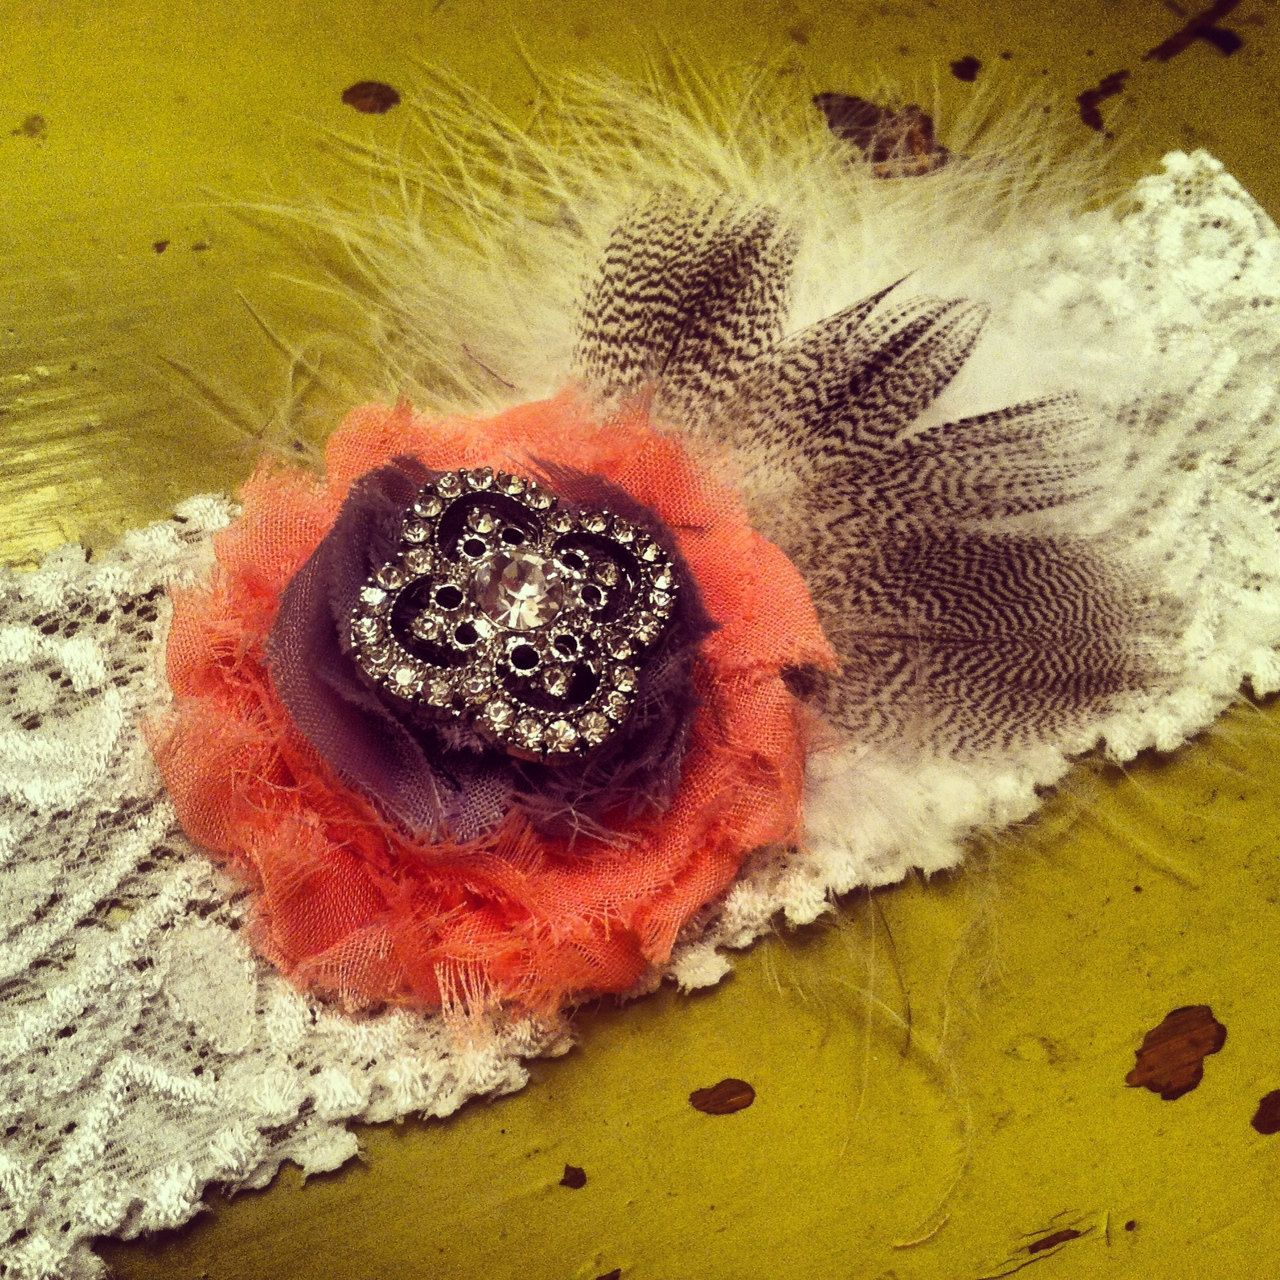 Coral Garter / Wedding garter / bridal garter/ lace garter / toss garter / Something Blue wedding garter / vintage inspired / Shabby garter. $22.99, via Etsy.